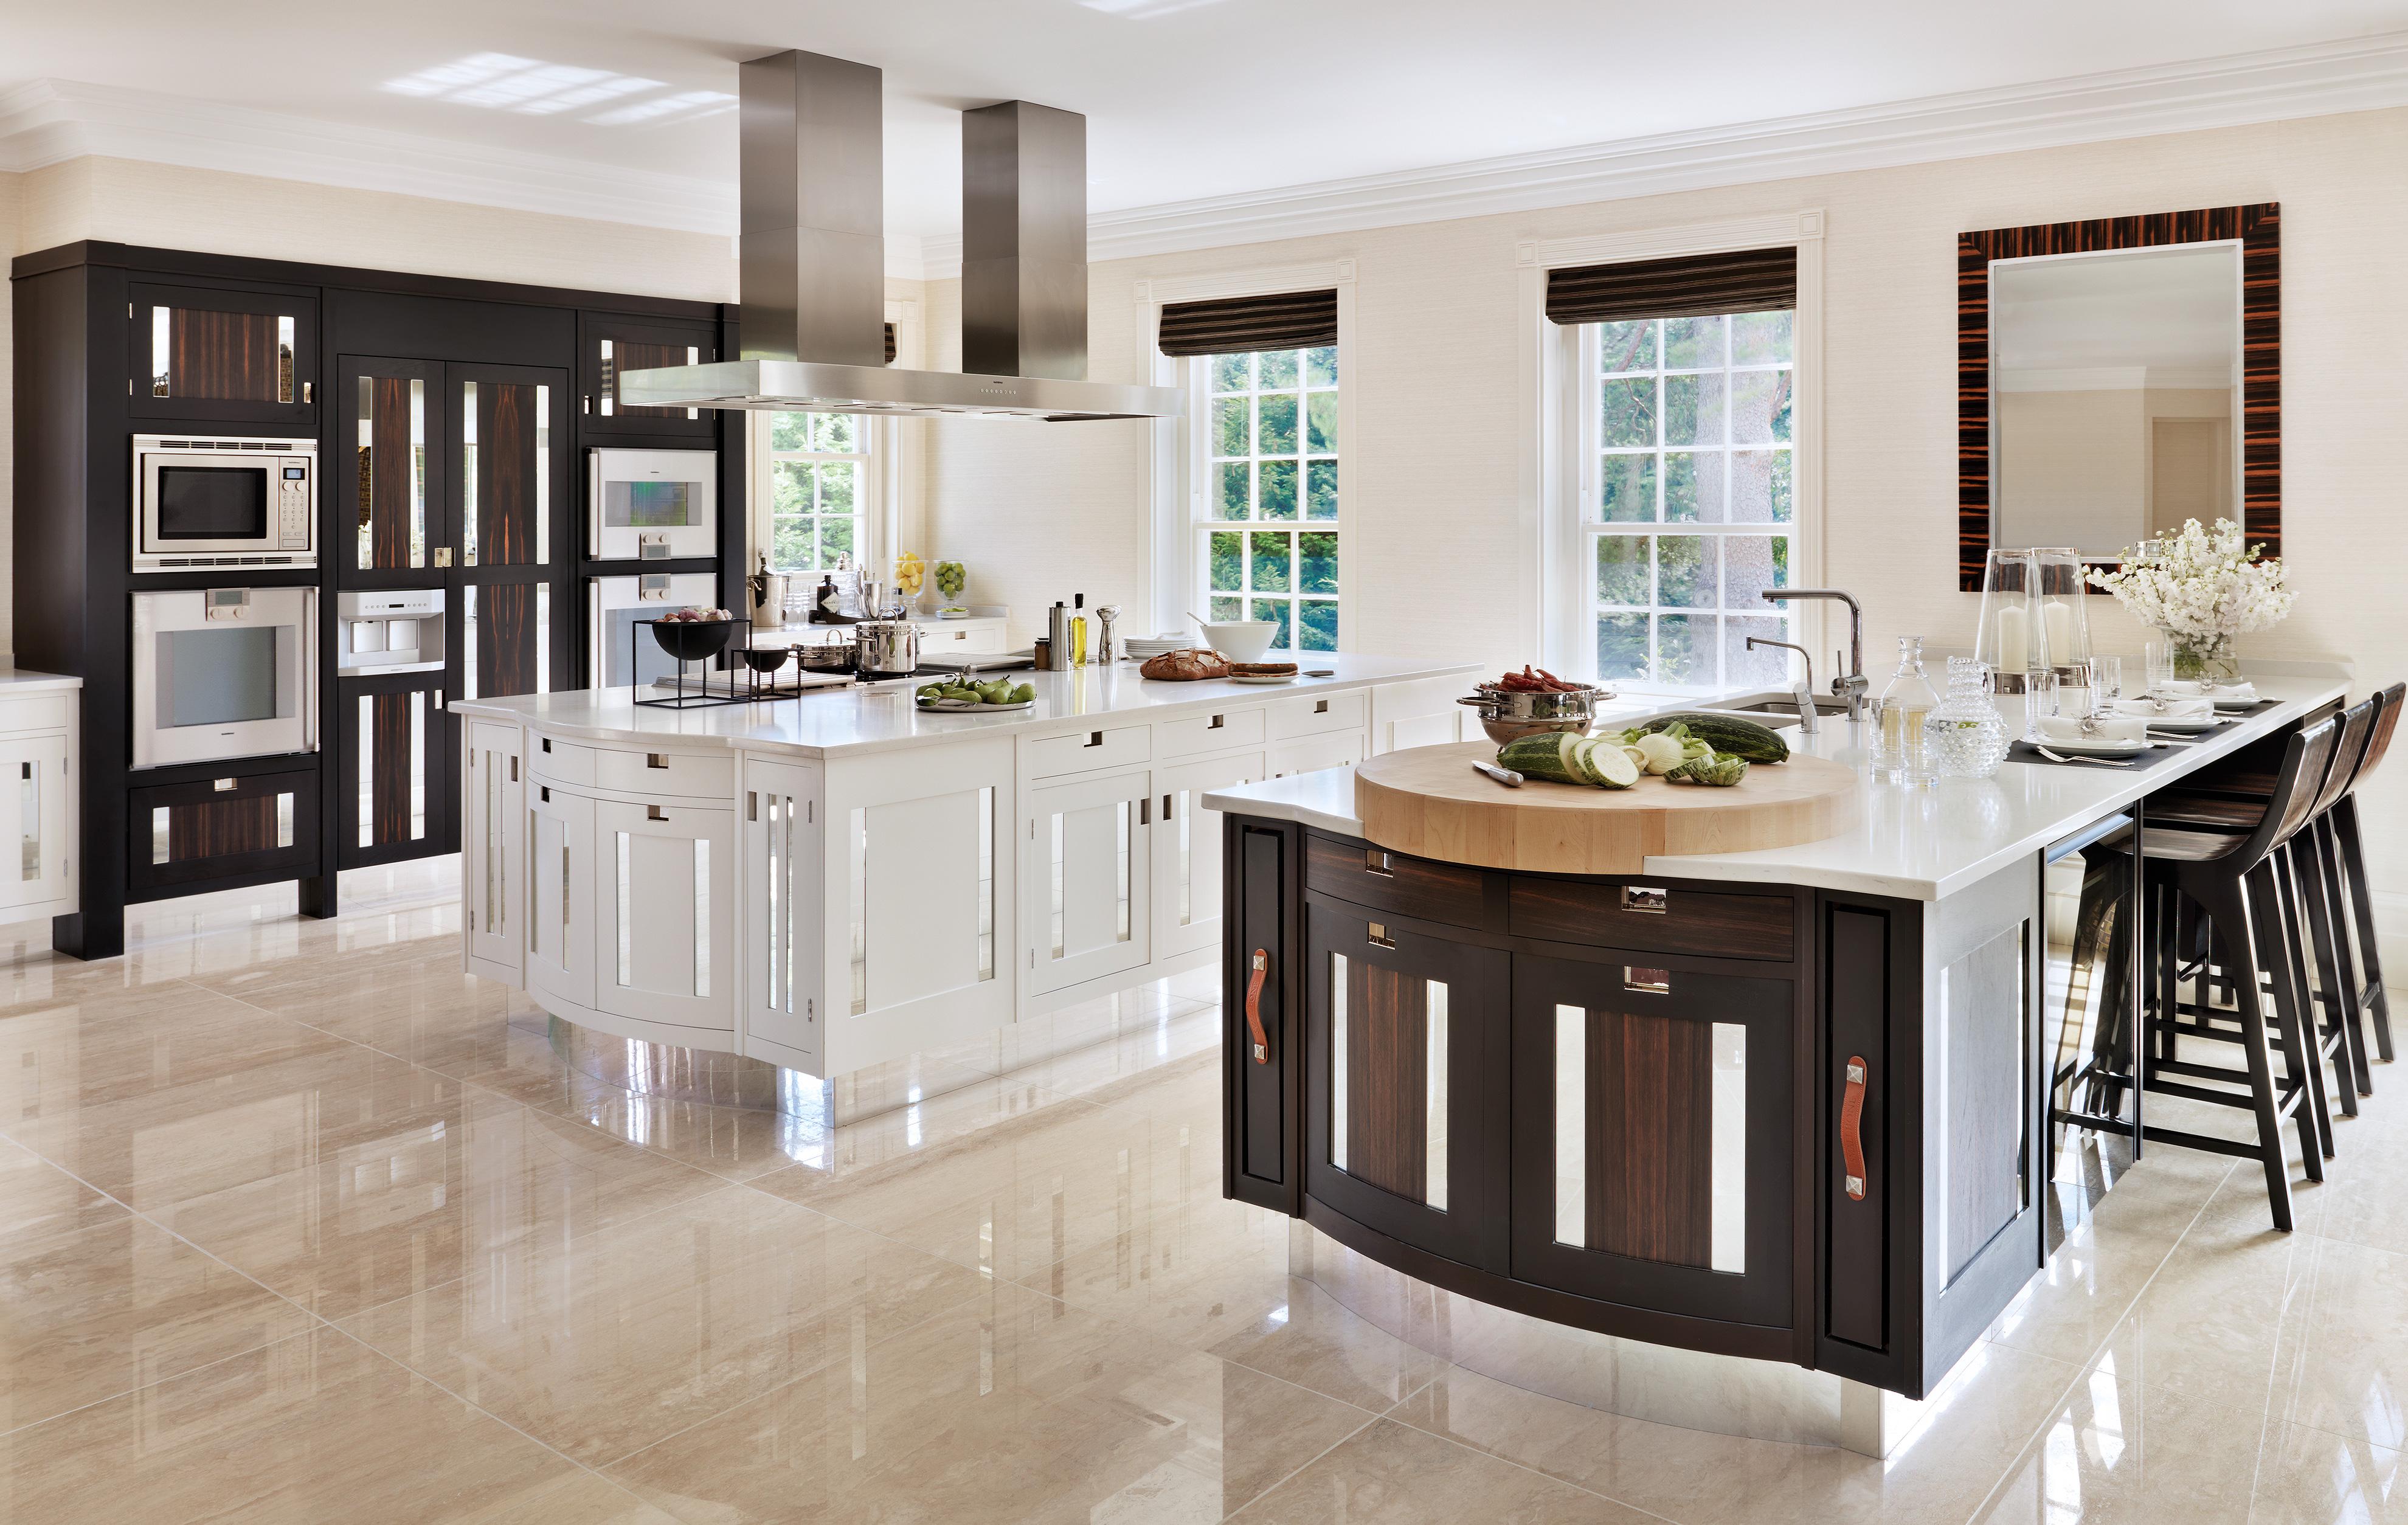 Apartment Handover: Kitchen & Bathroom